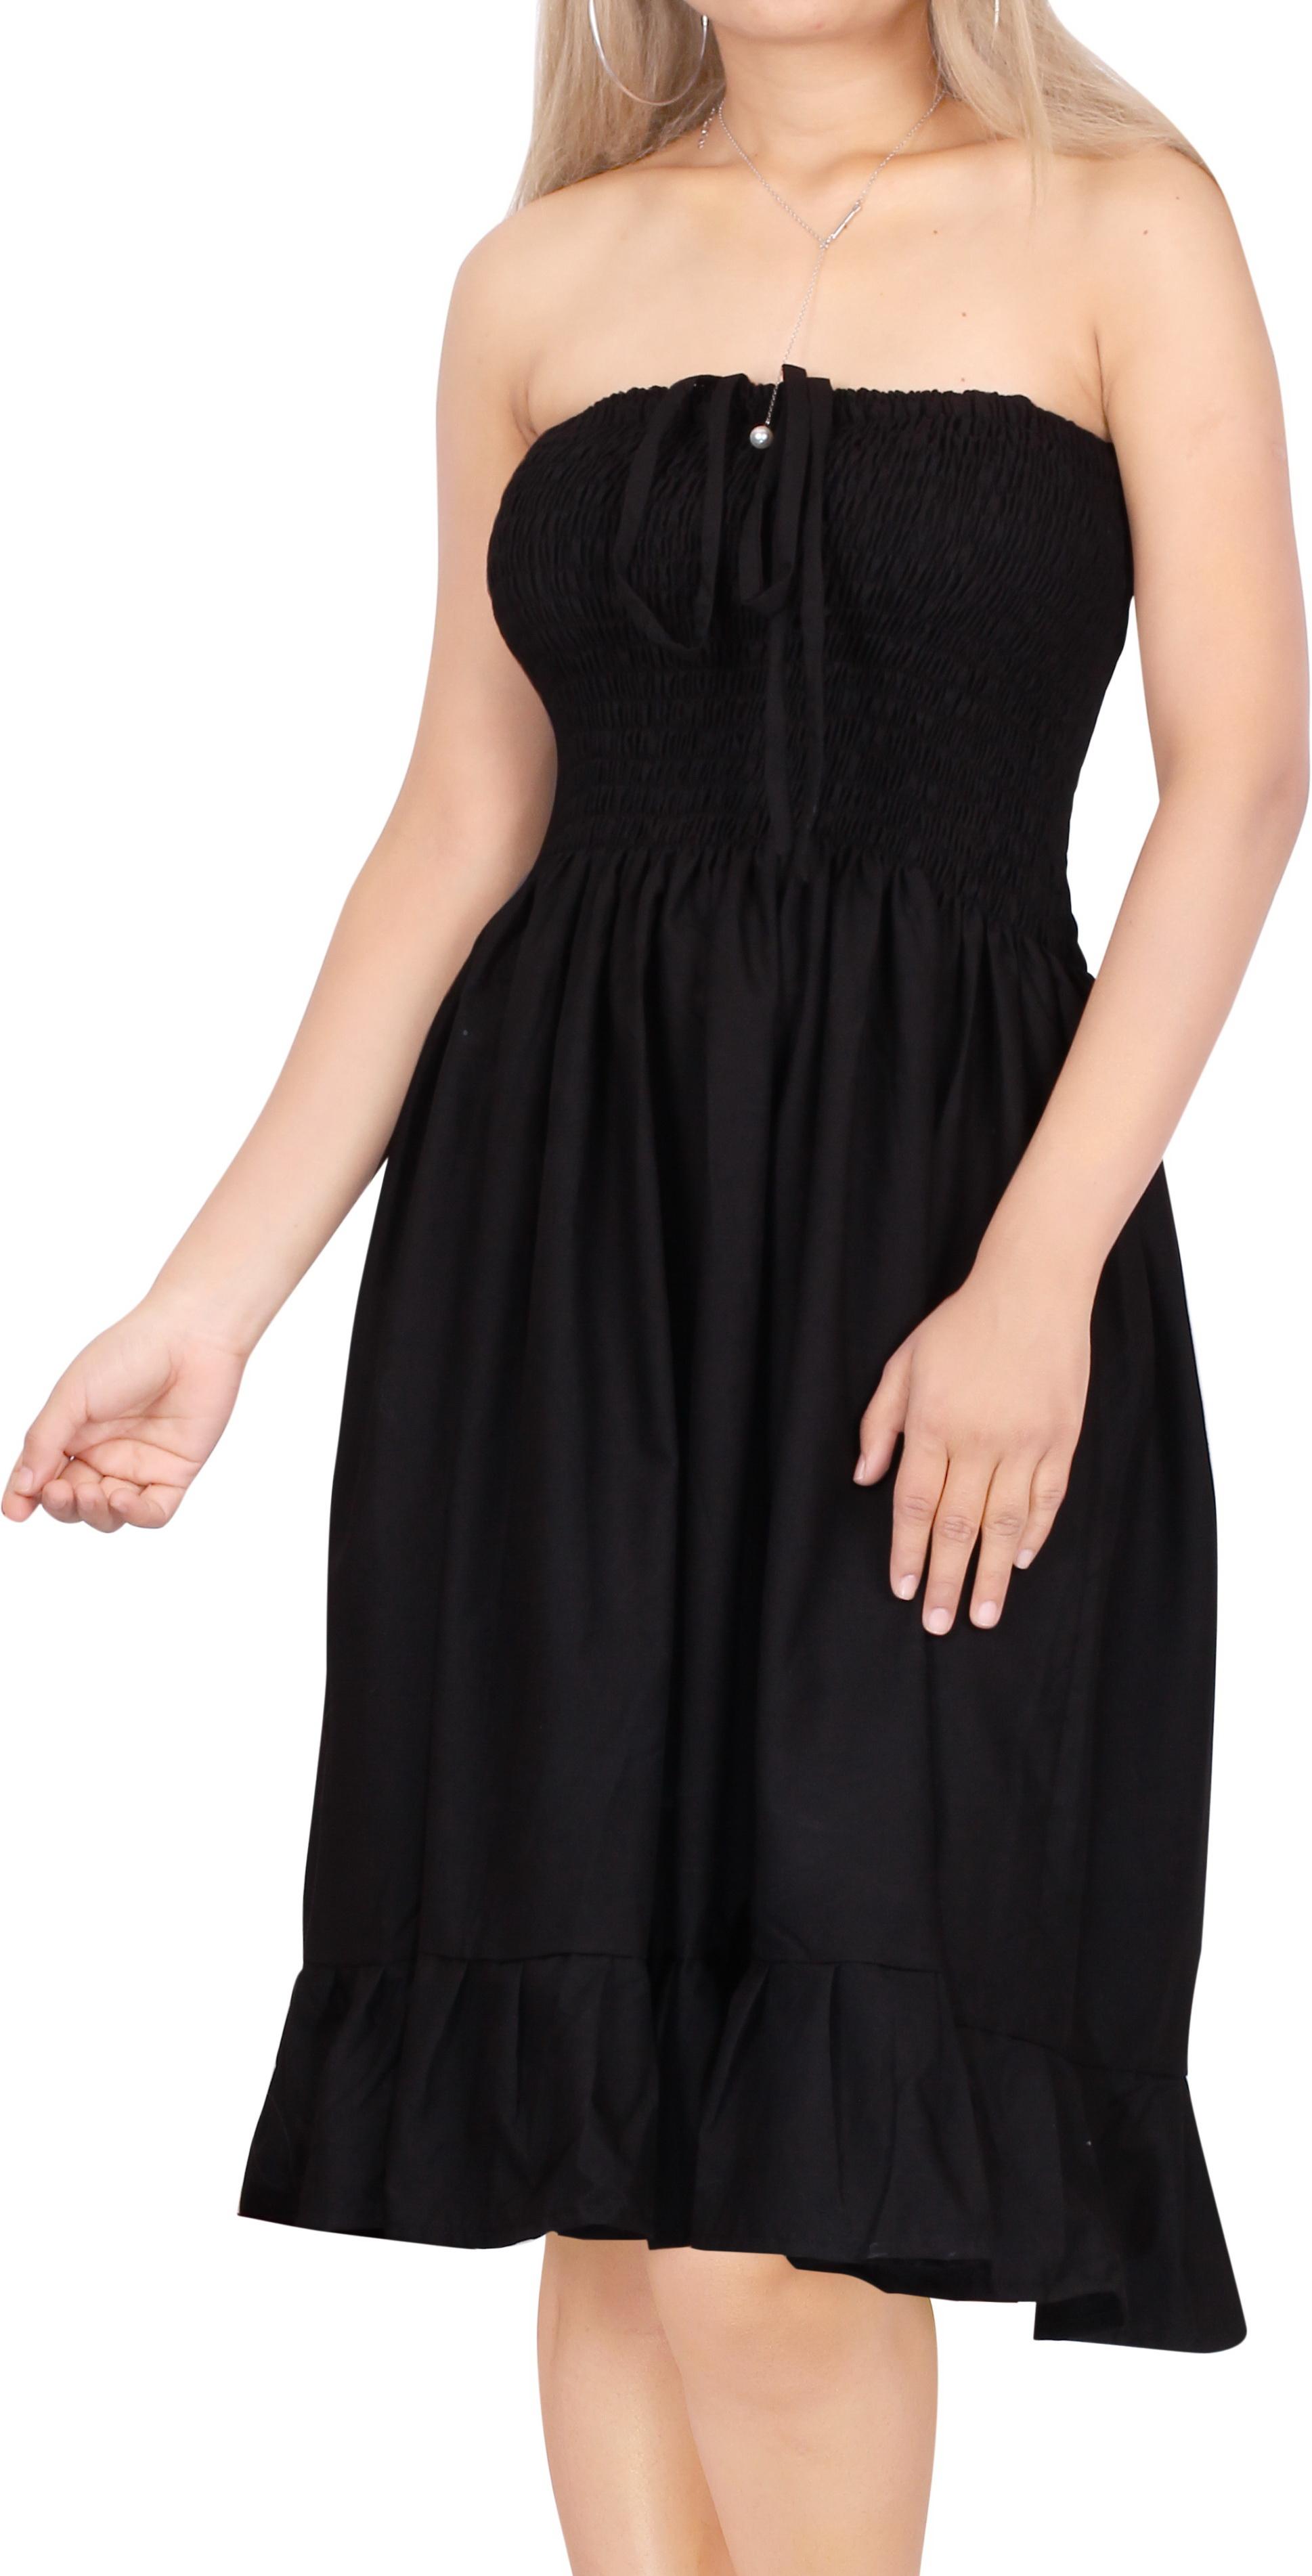 knee length cover up top dress skirt maxi honeymoon